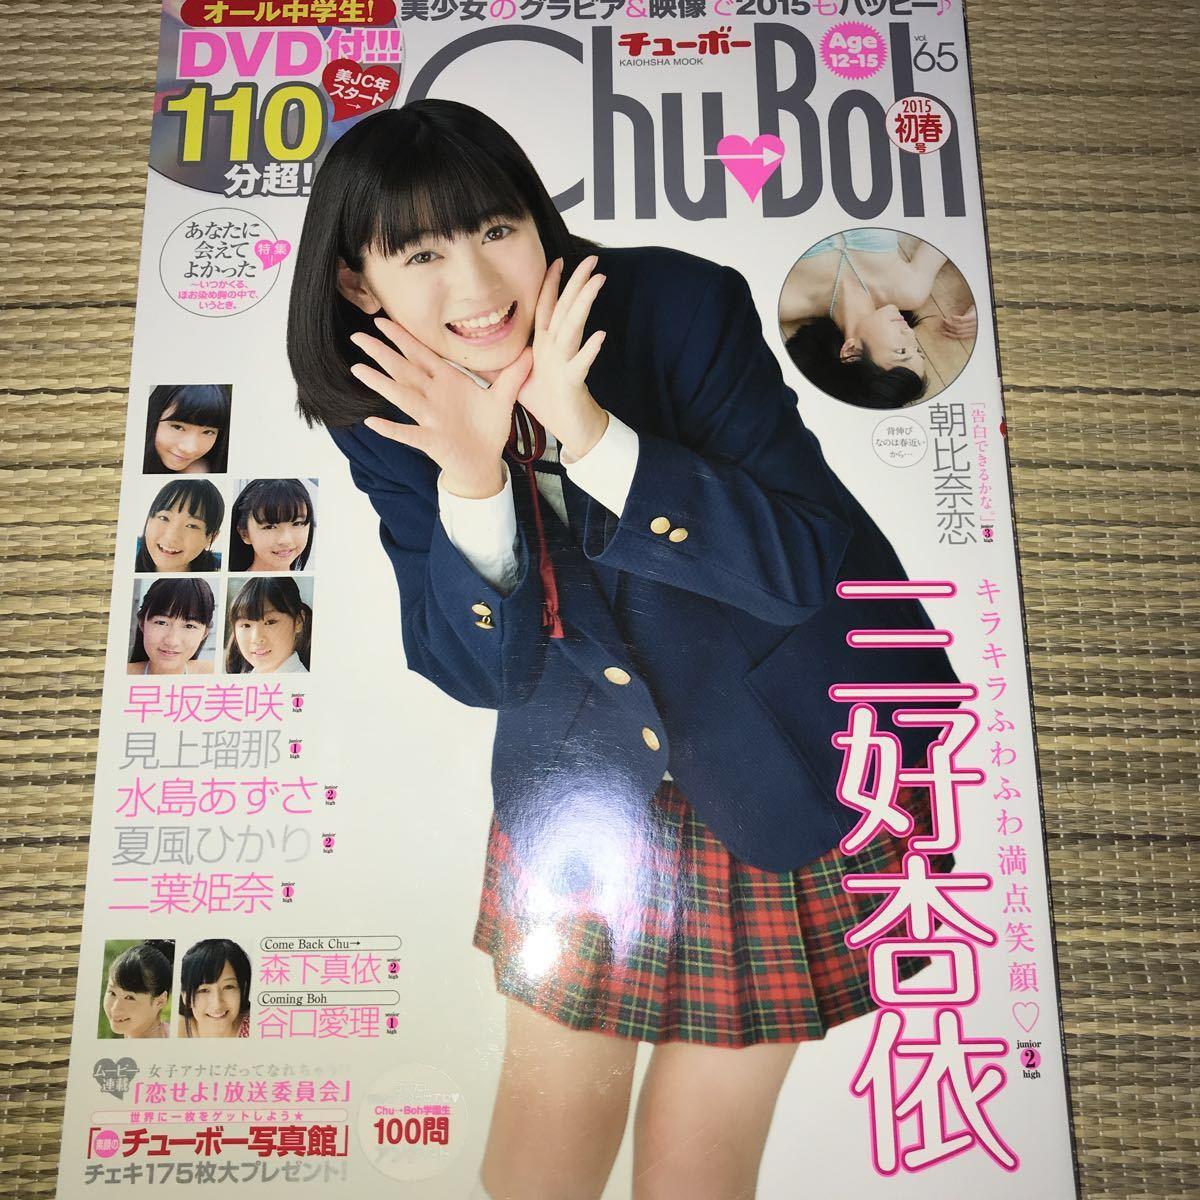 Chu→Boh vol.65 三好杏依 早坂美咲 見上瑠那 水島あずさ 夏風ひかり 二葉姫奈